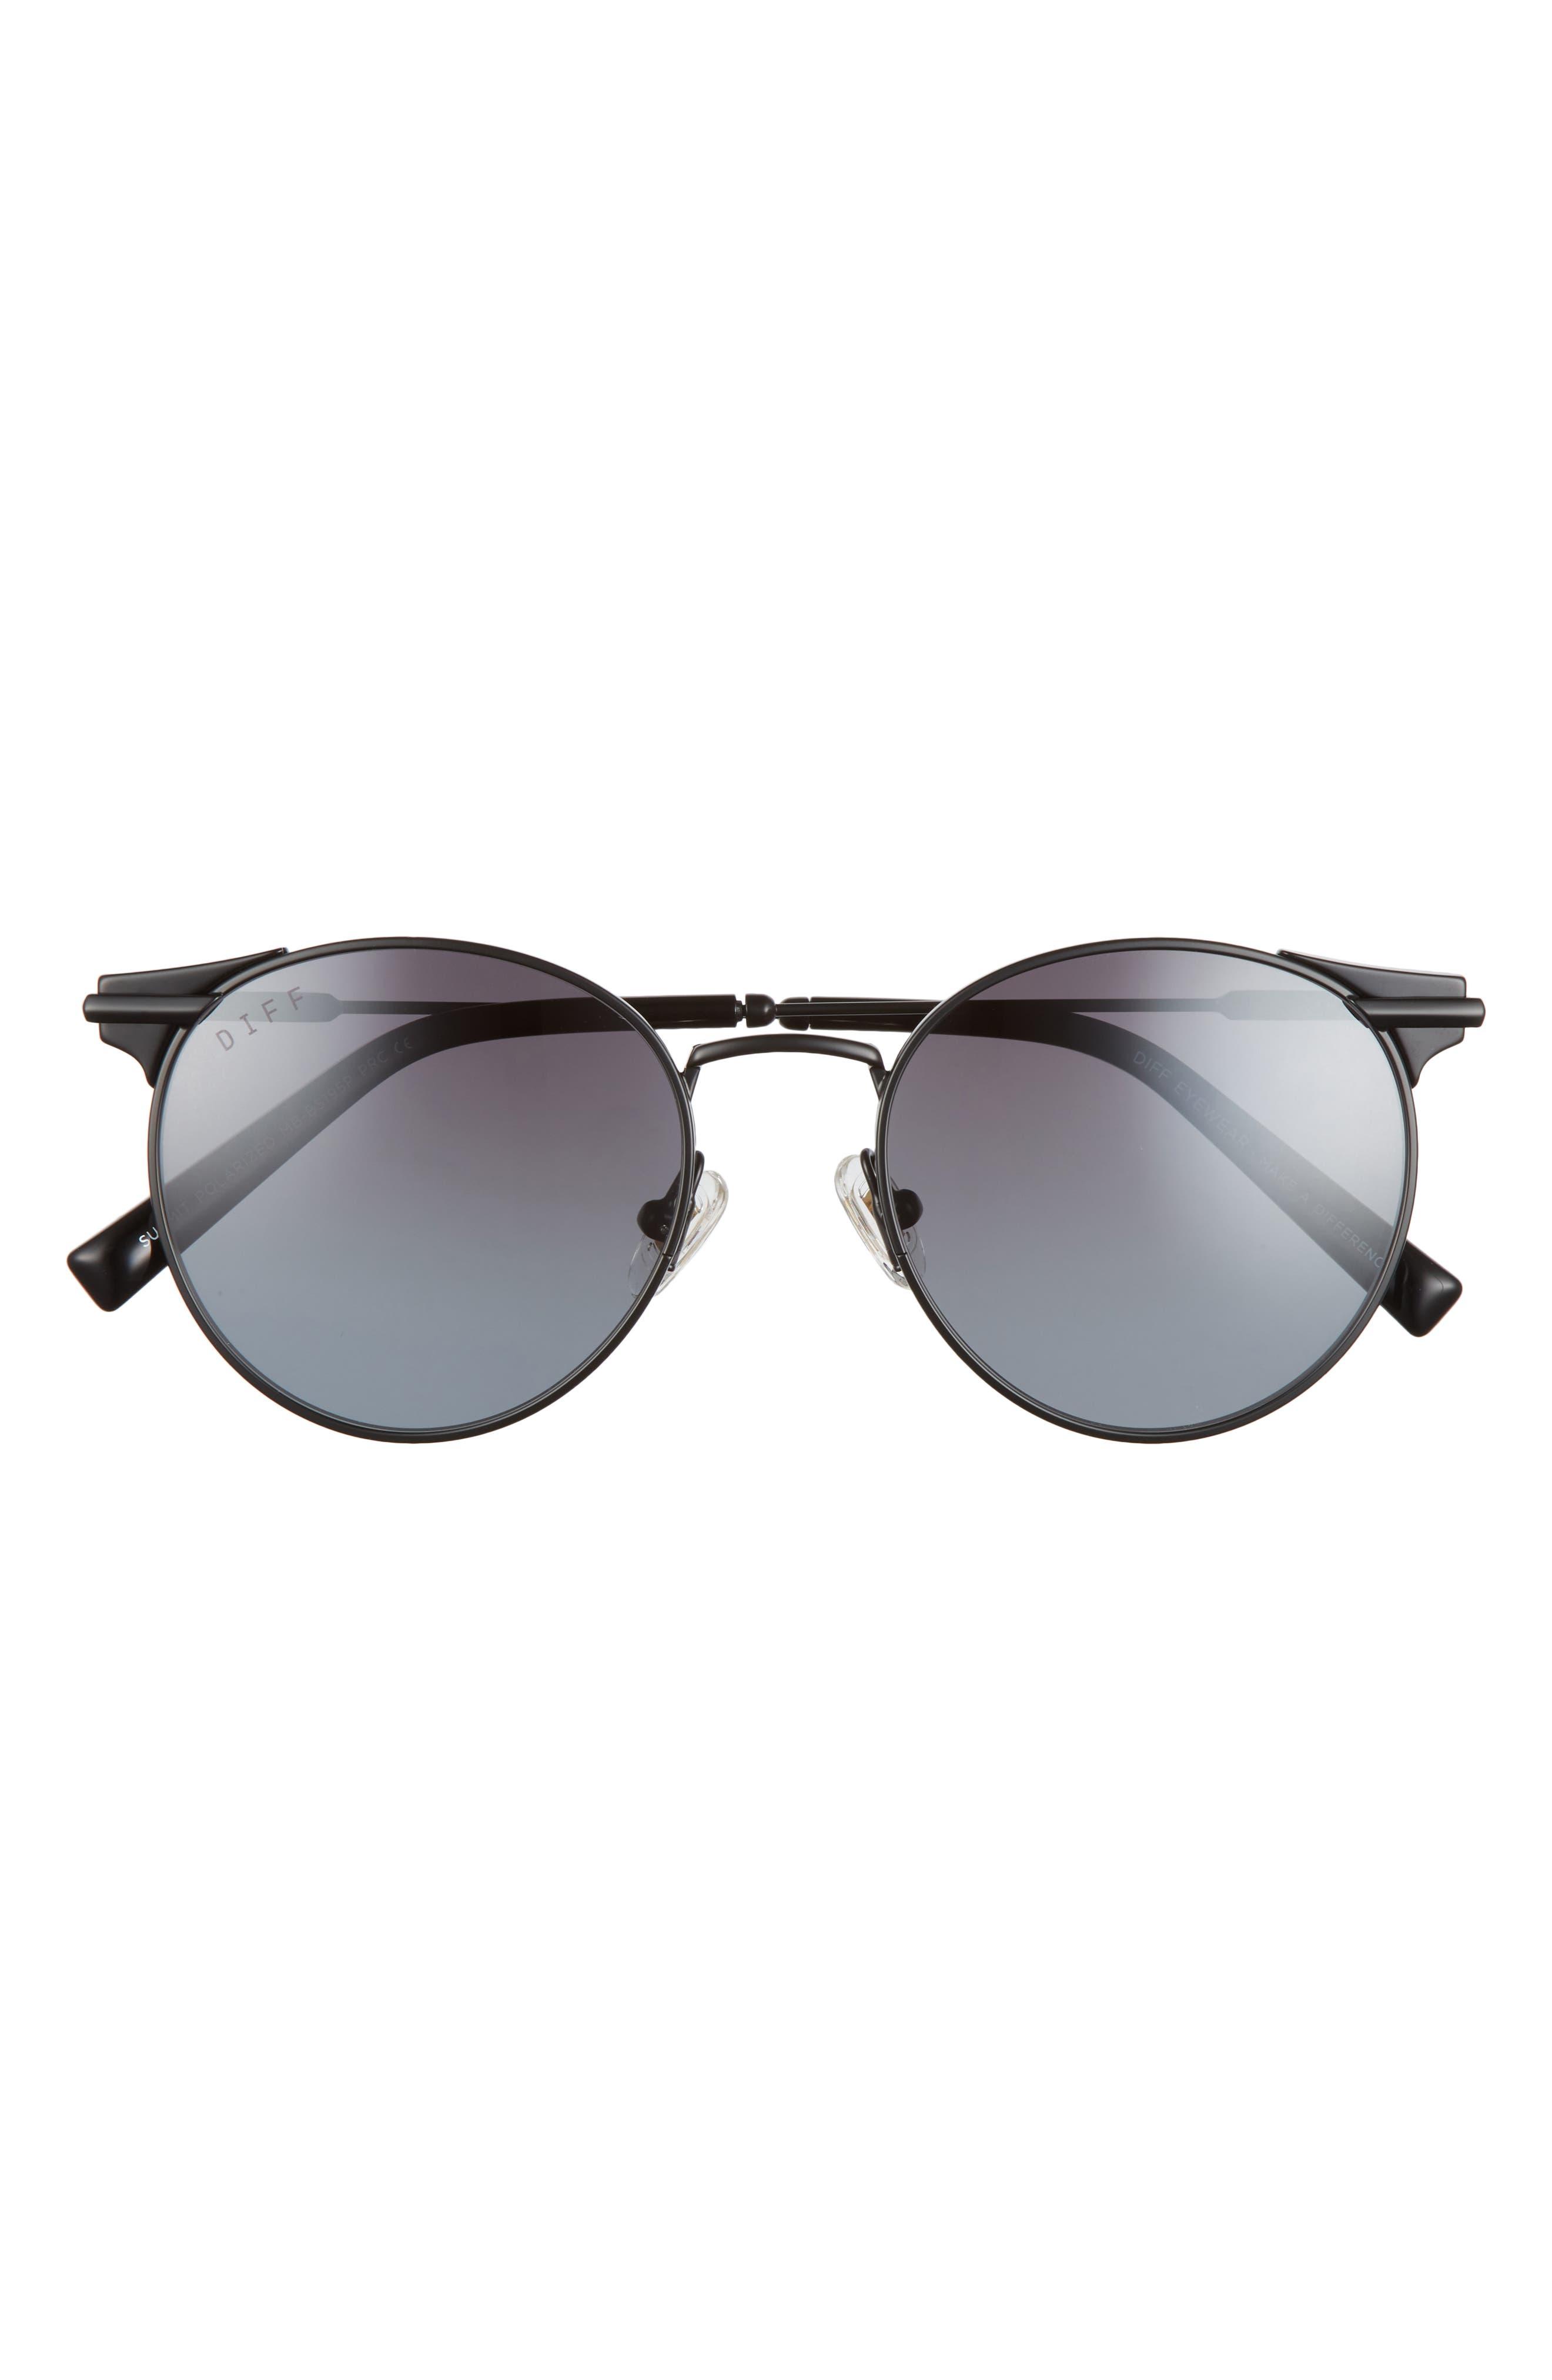 Summit 53mm Gradient Polarized Round Sunglasses